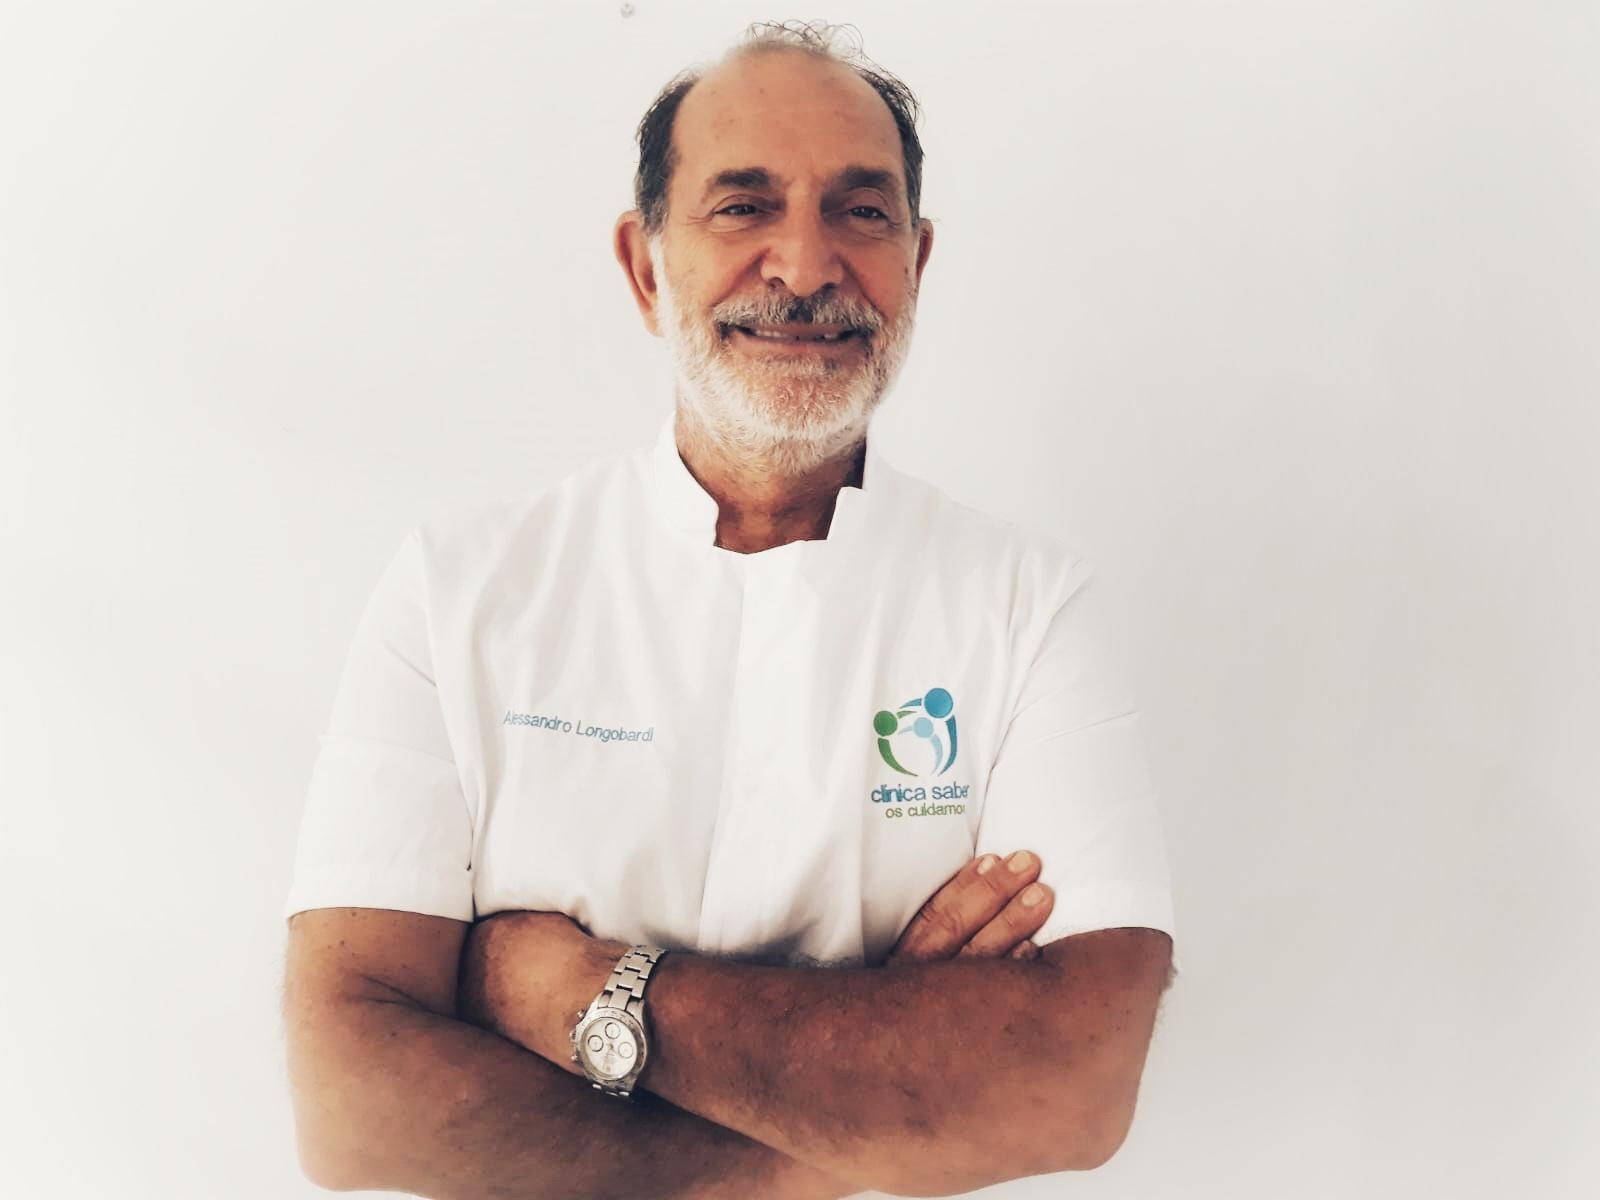 Dr. Alessandro longobardi - Médico dentista en Tenerife